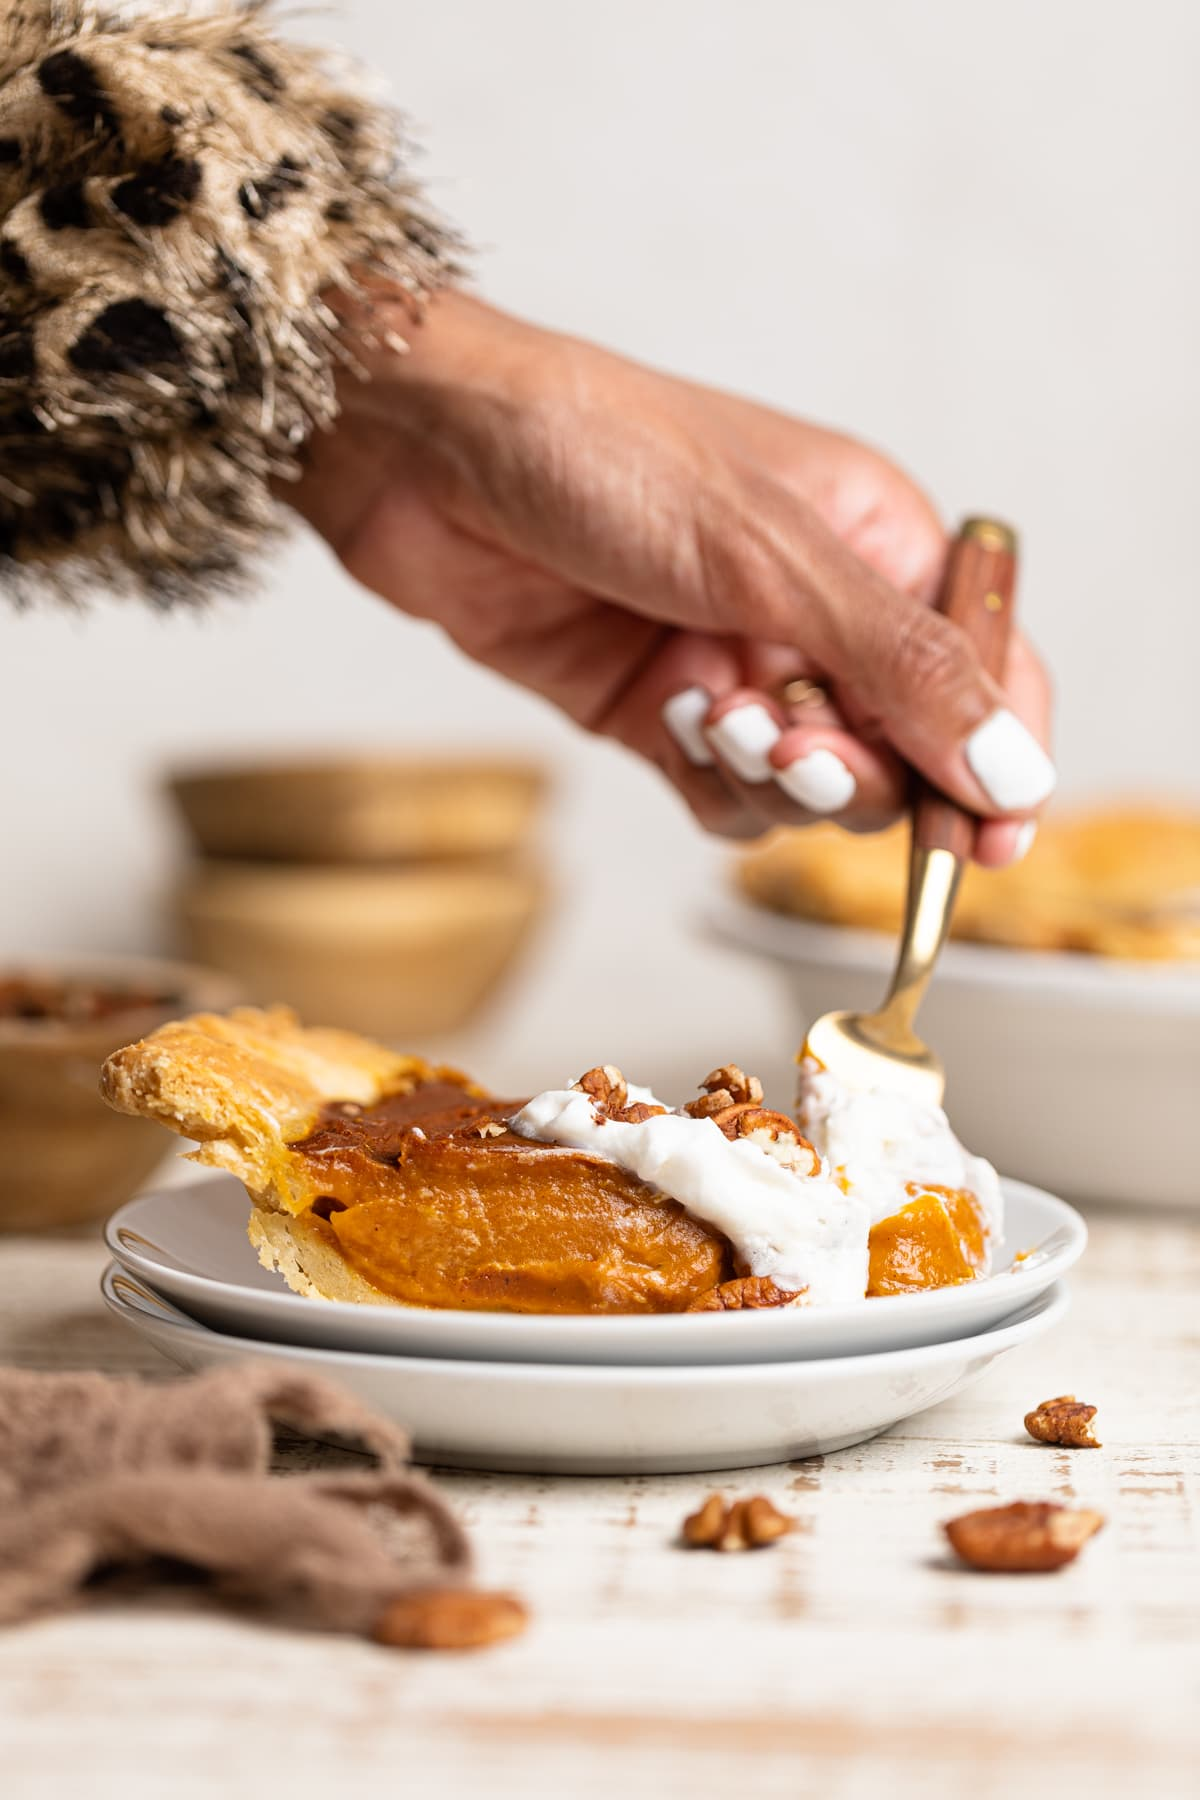 Delicious Vegan Pumpkin Pie